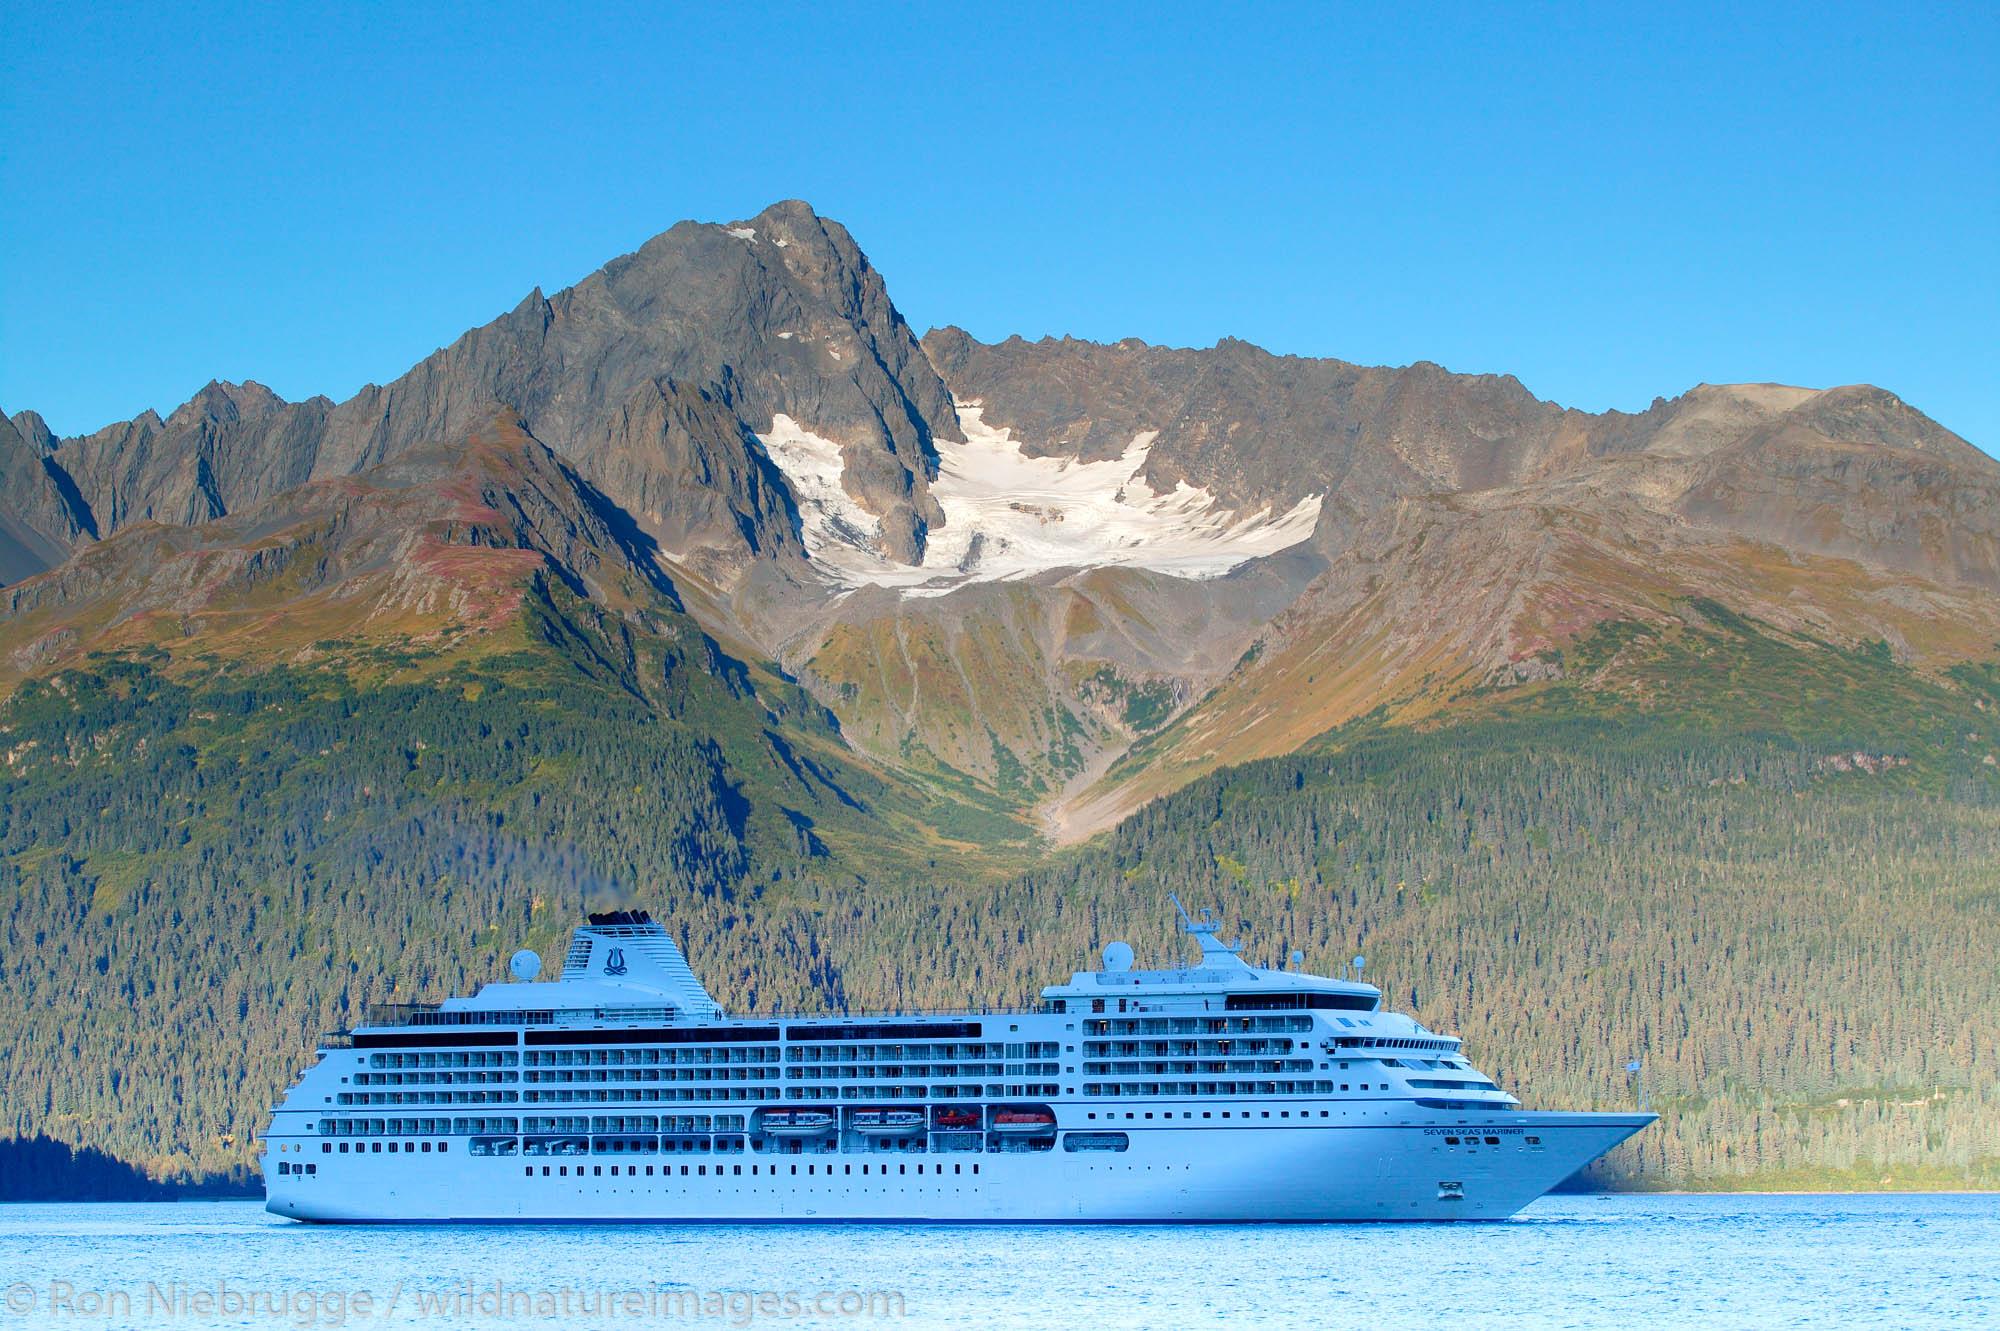 The Radisson Seven Seas Cruises ship Seven Seas Mariner in Resurrection Bay, Seward, Alaska.